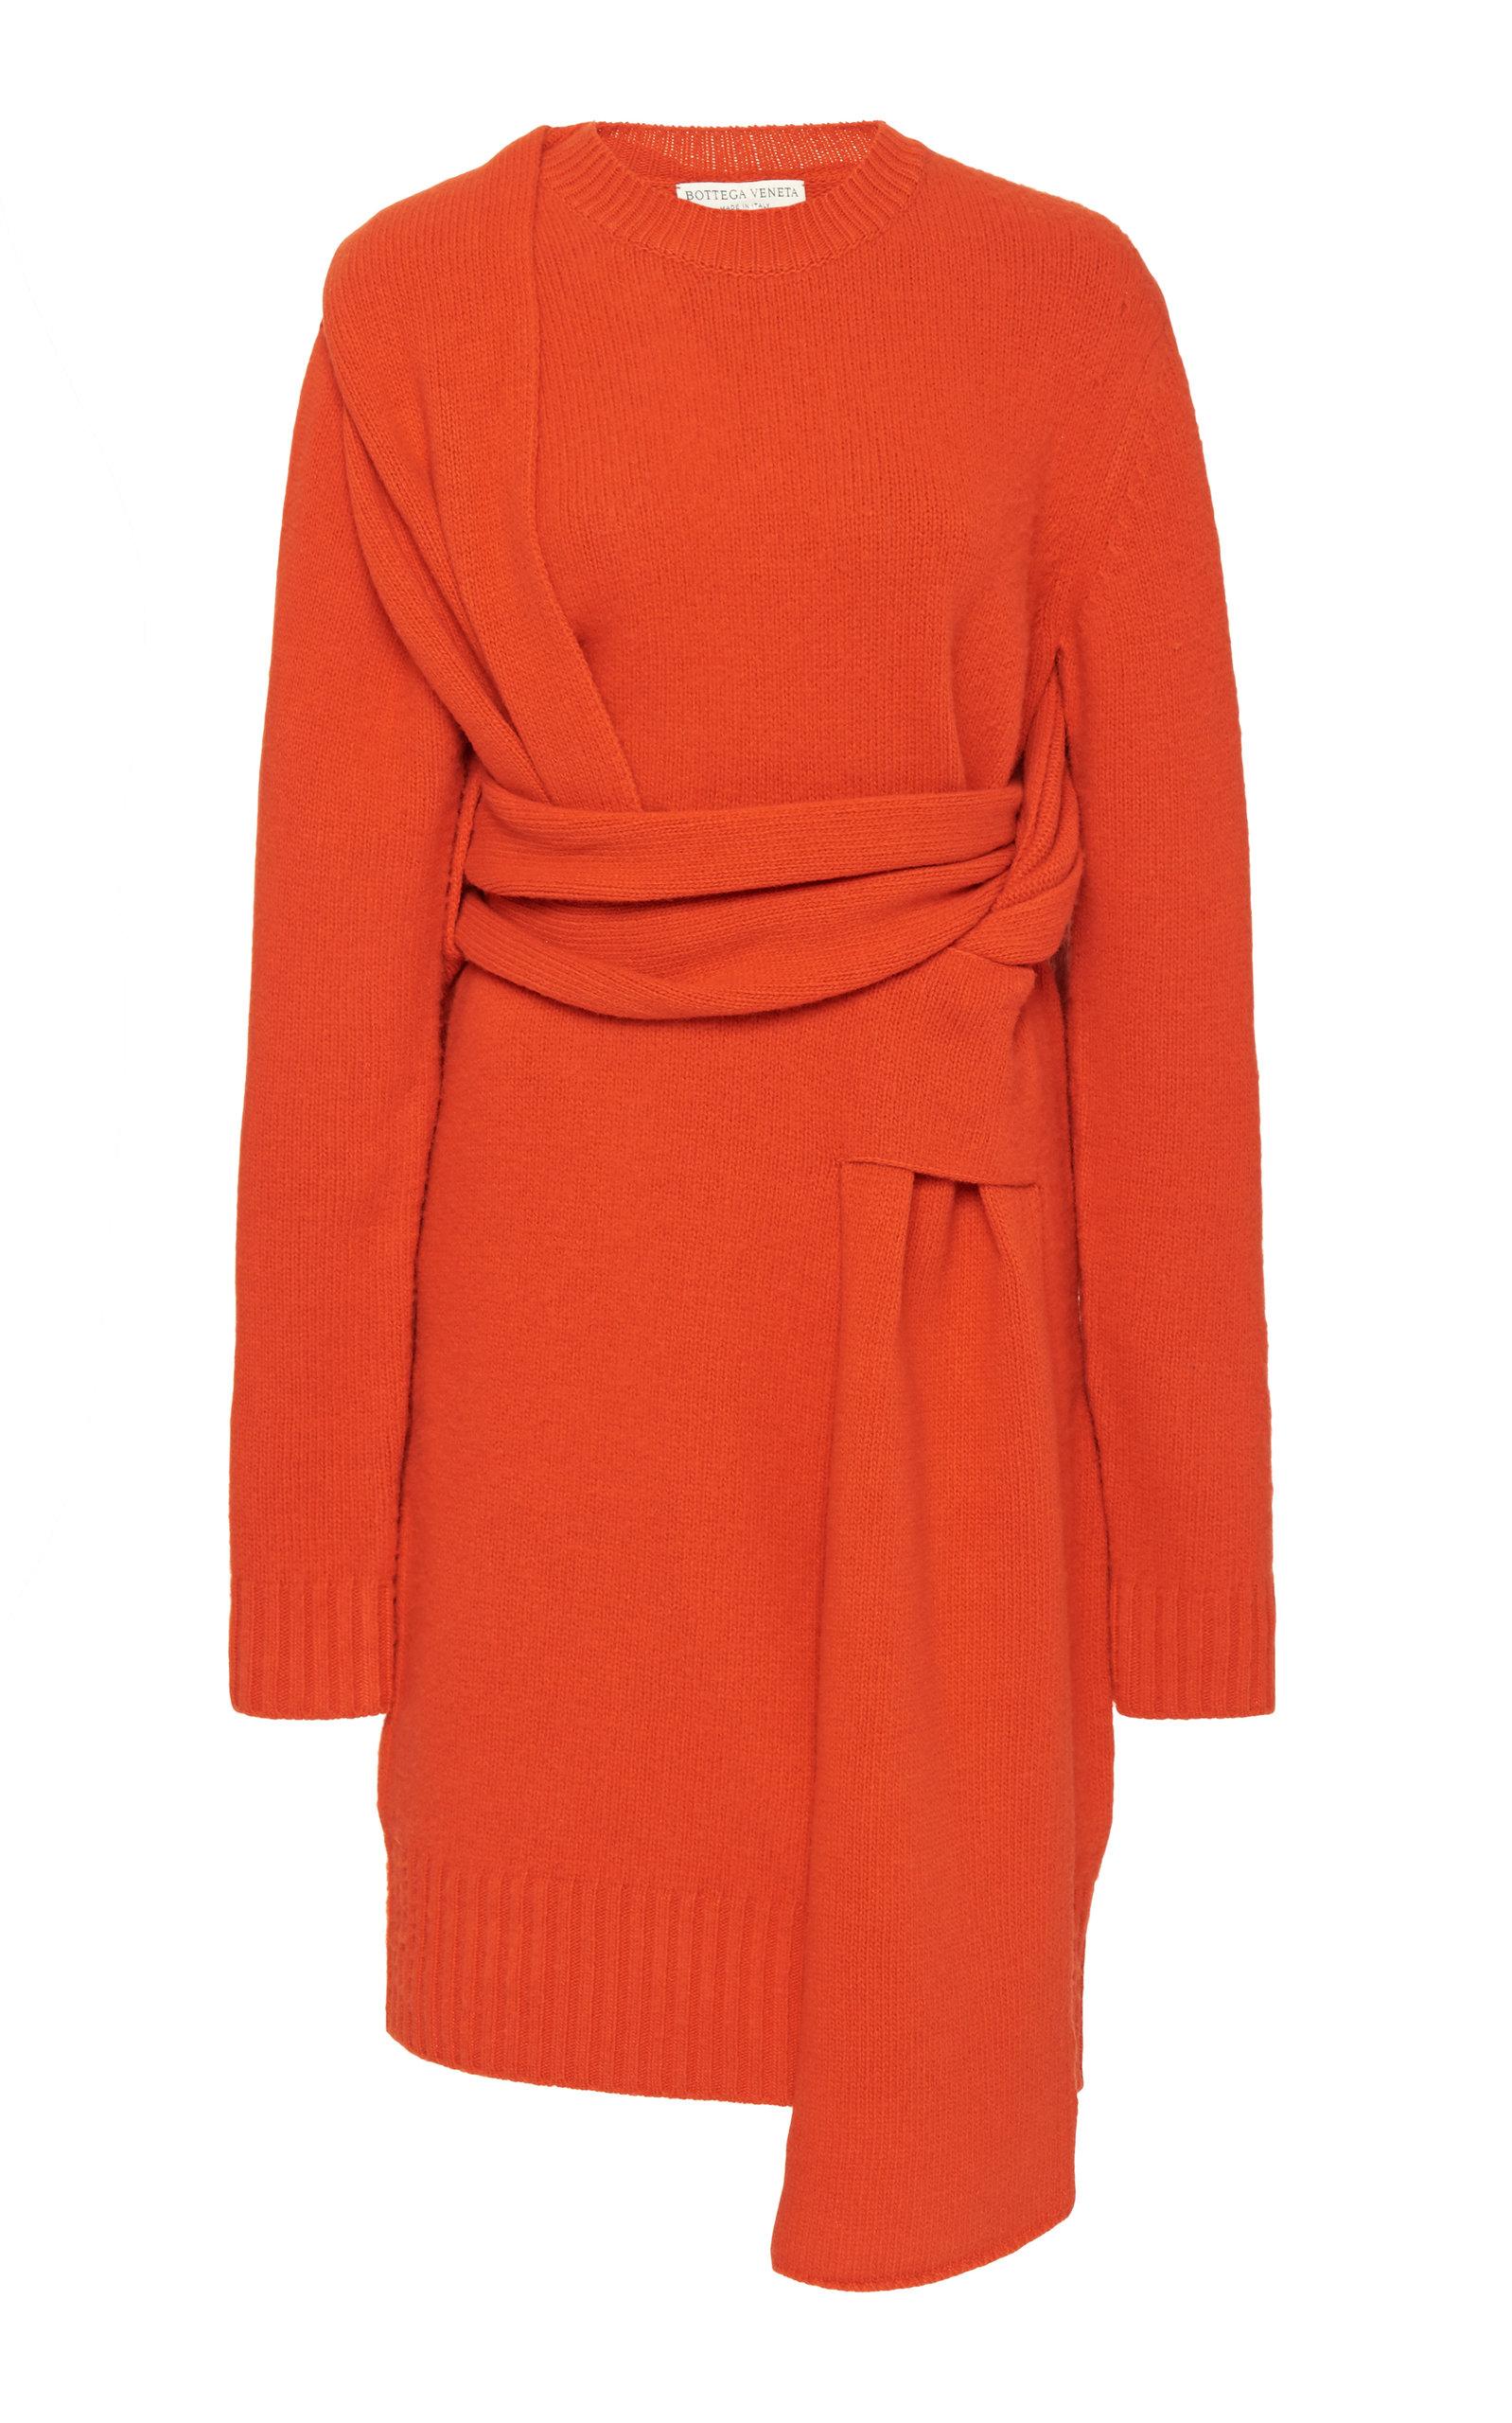 Bottega Veneta Dress Knot-Detailed Wool Sweater